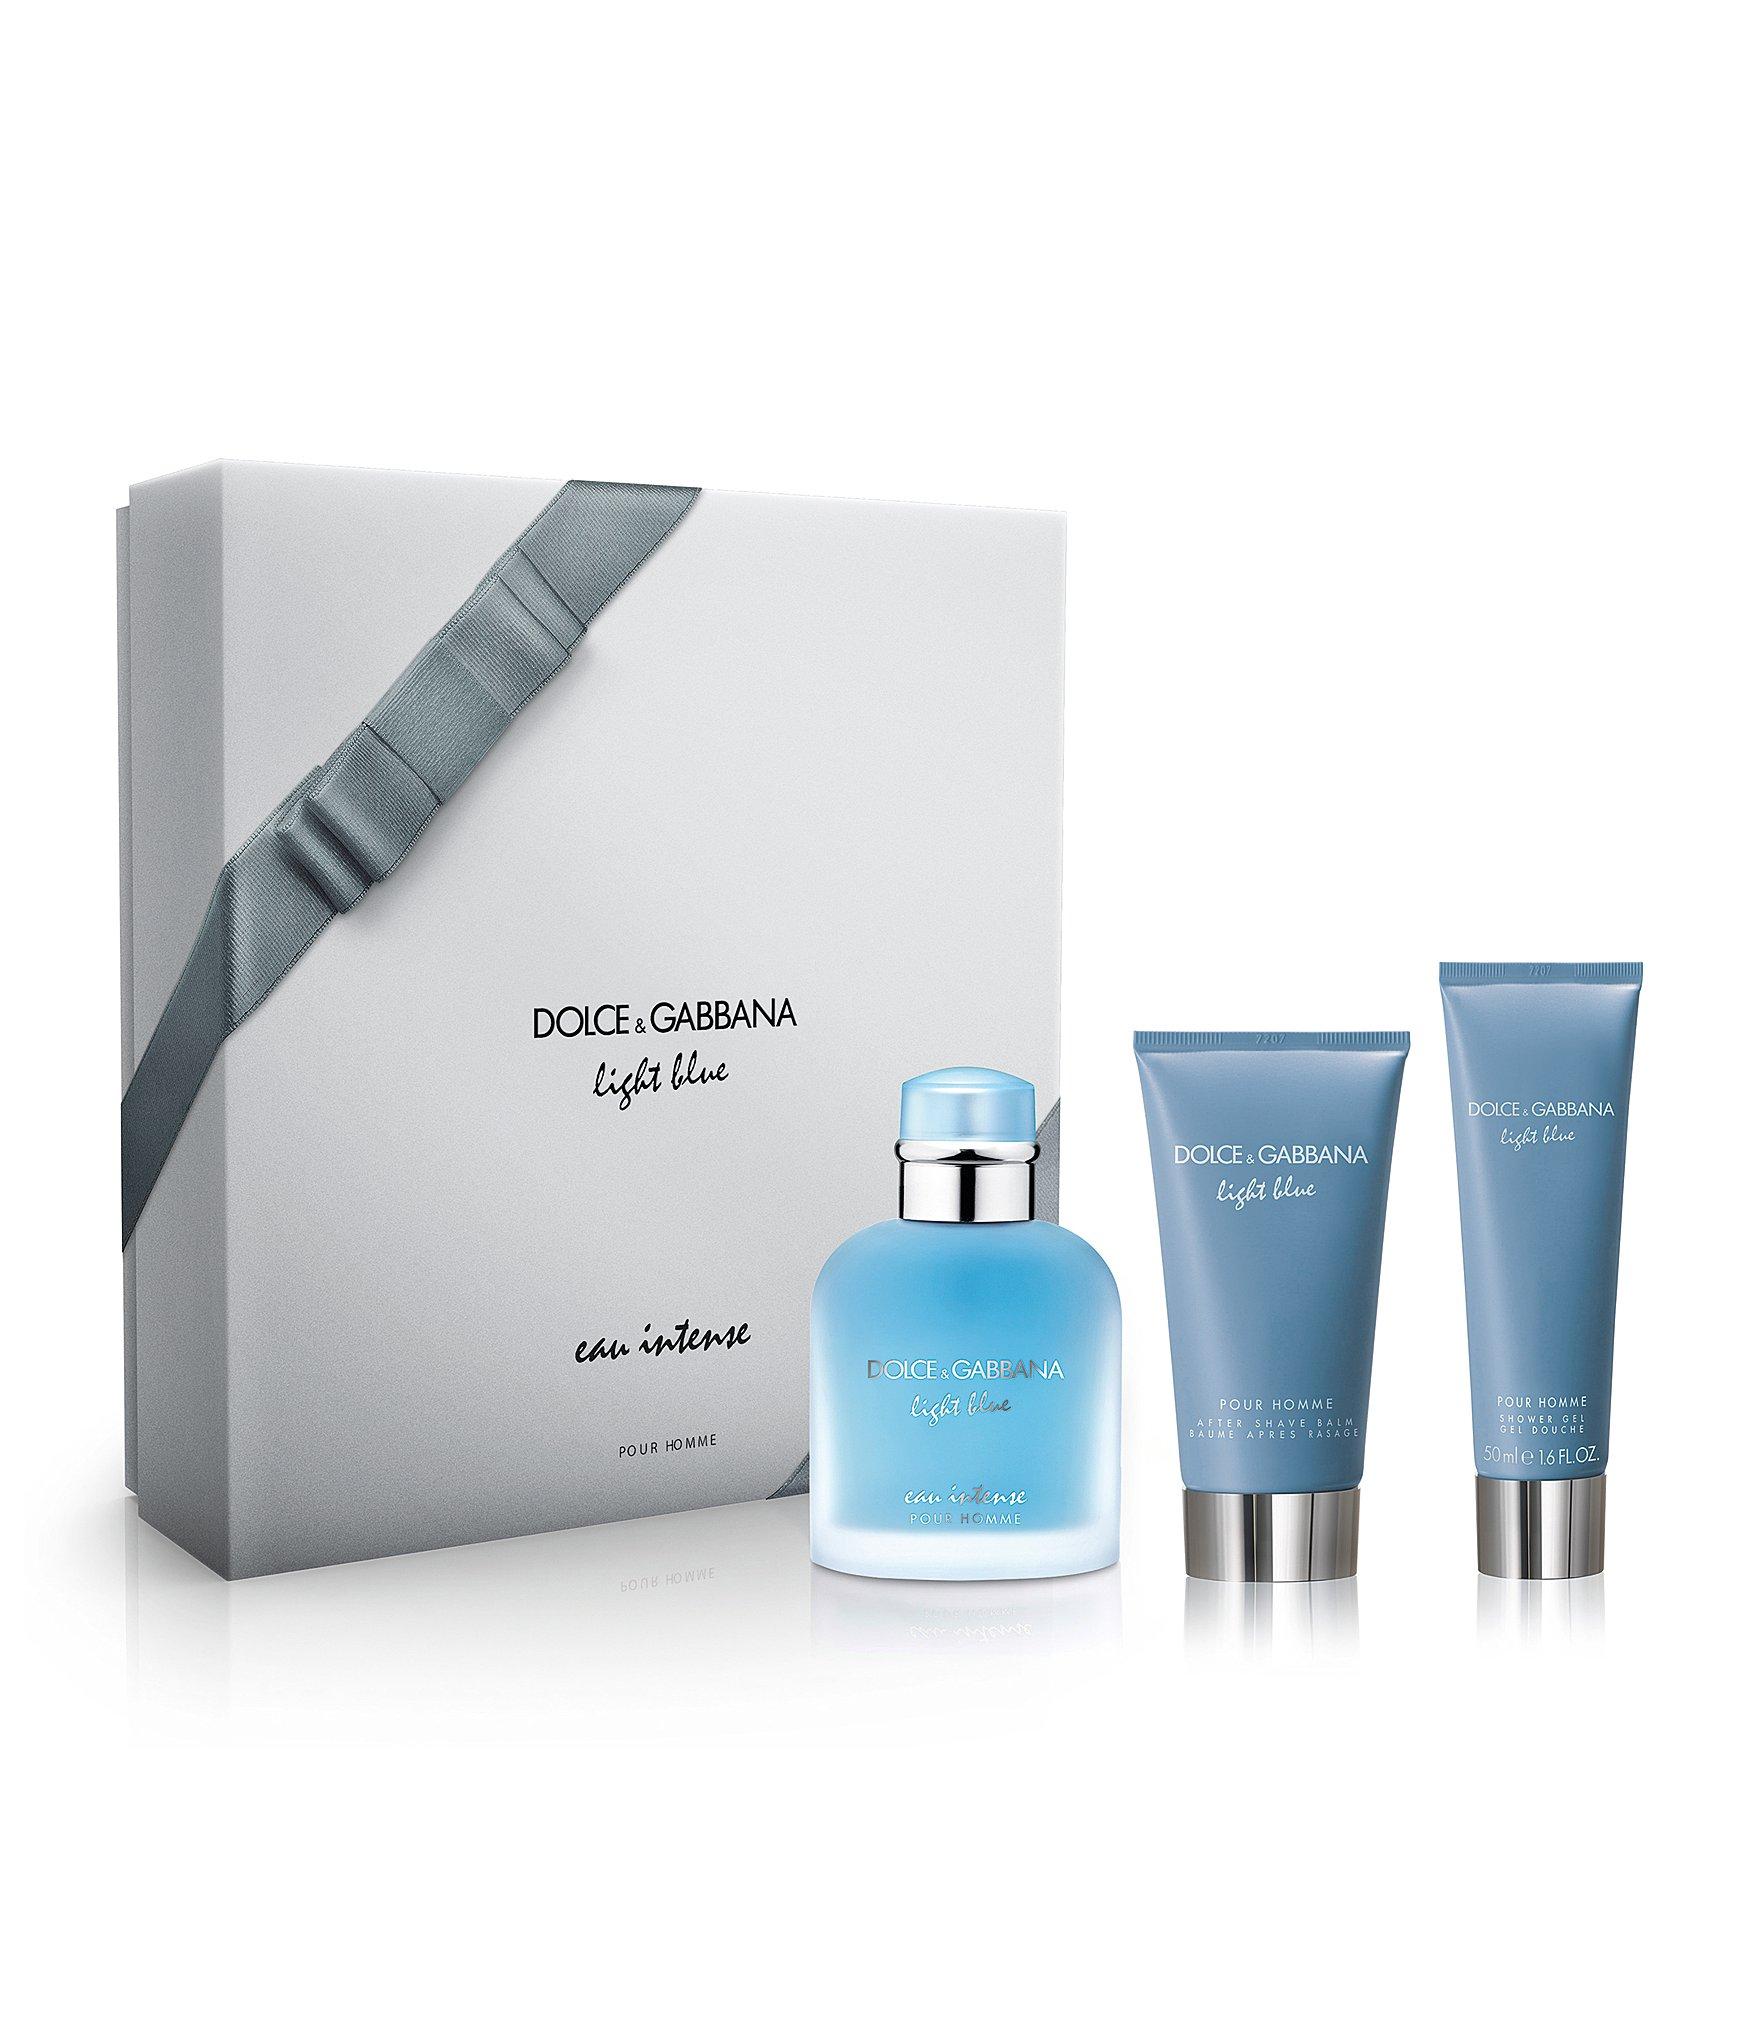 dolce gabbana light blue eau intense pour homme gift set dillards. Black Bedroom Furniture Sets. Home Design Ideas